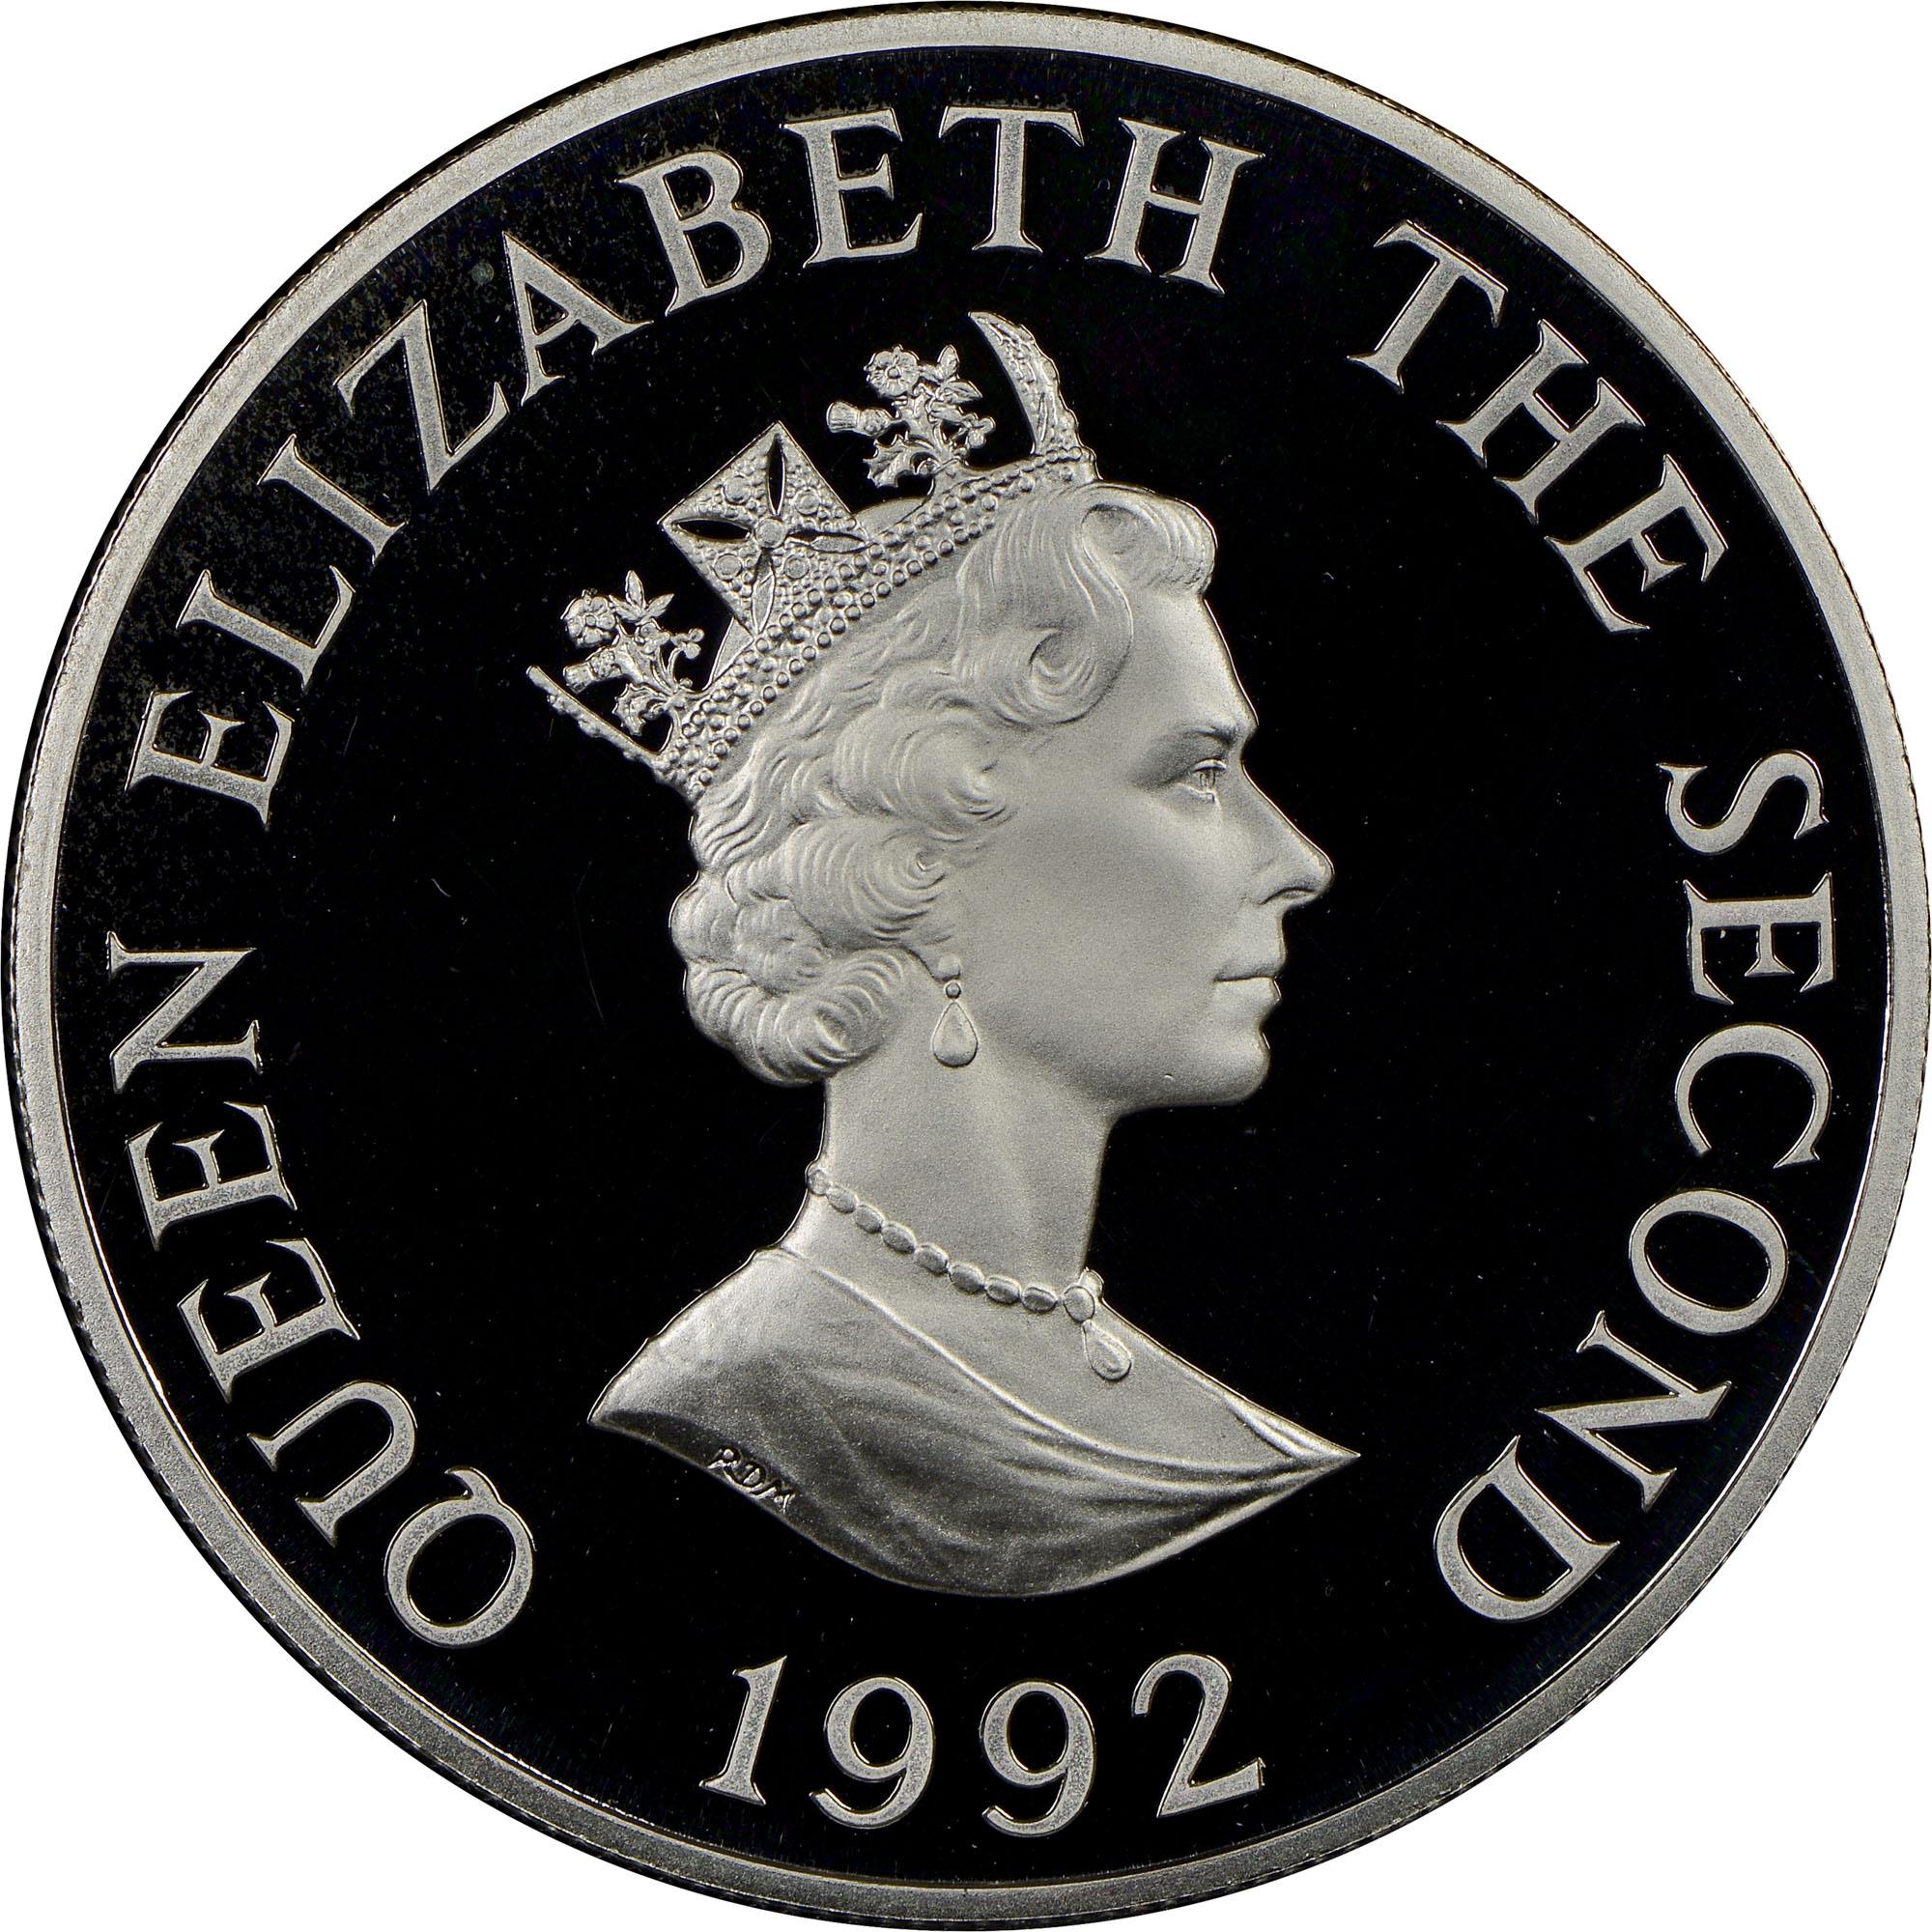 1992 Alderney 2 Pounds obverse